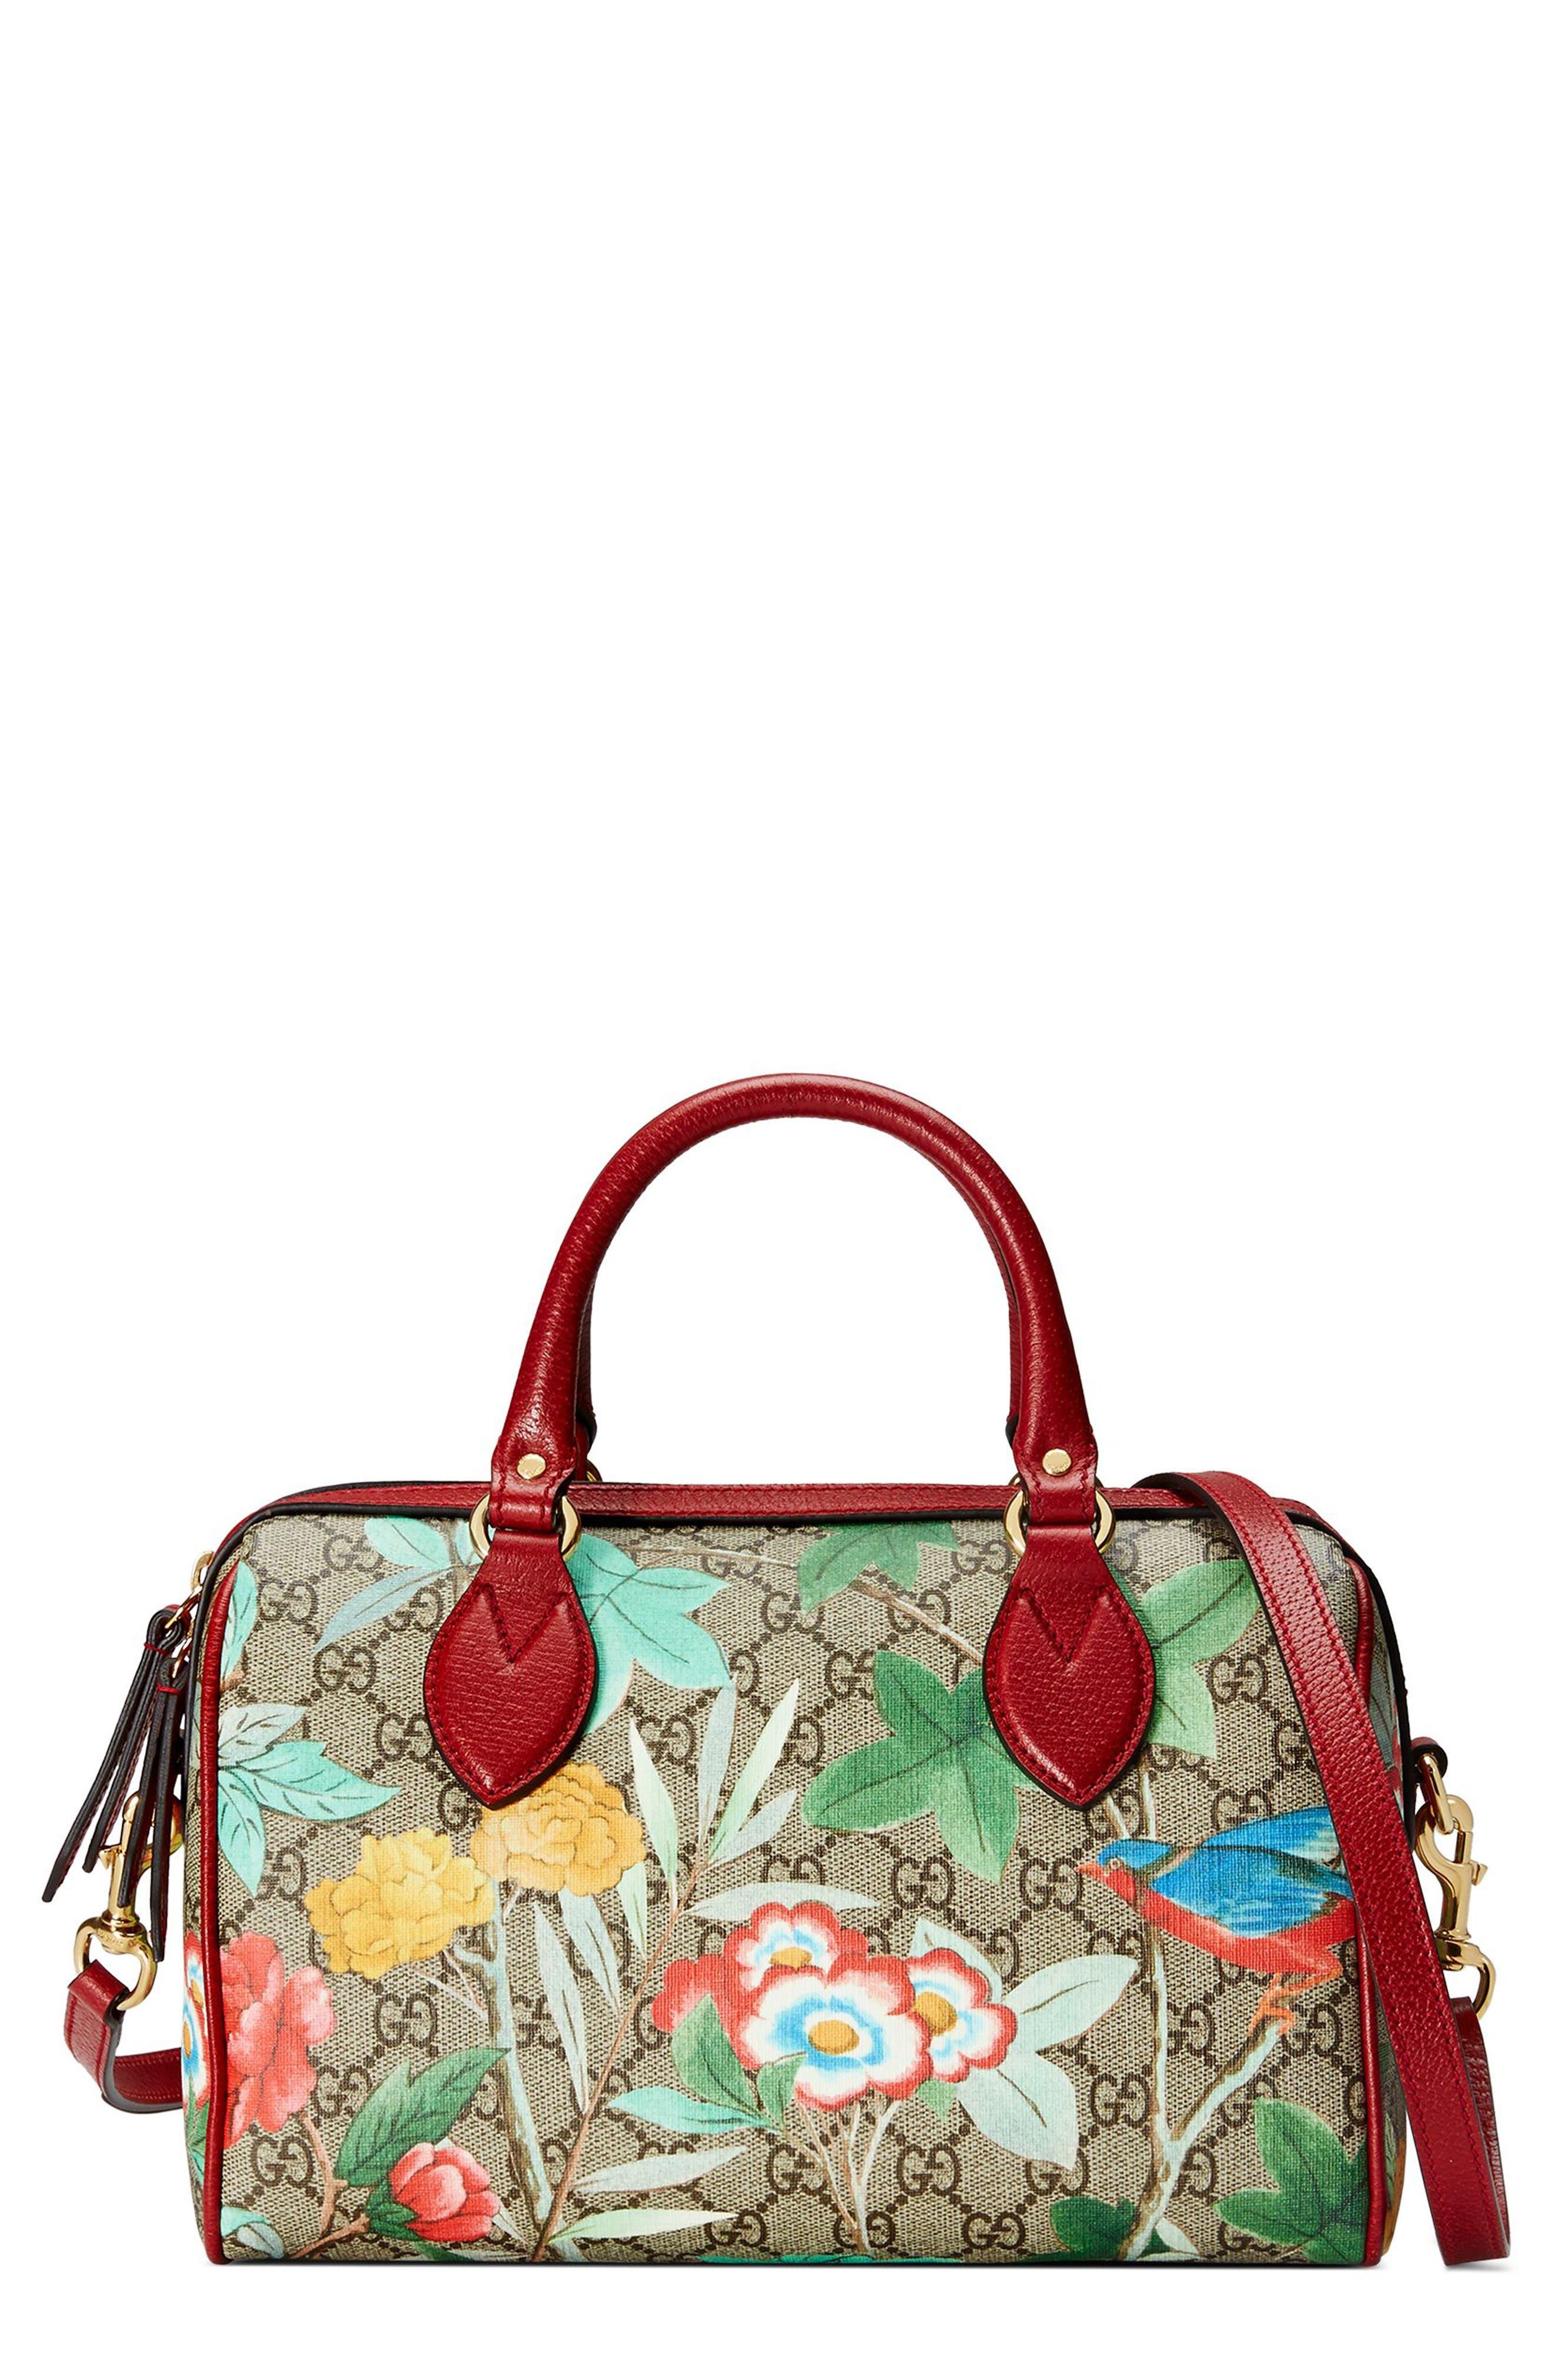 Tian Boston GG Supreme Small Canvas Duffel Bag,                             Main thumbnail 1, color,